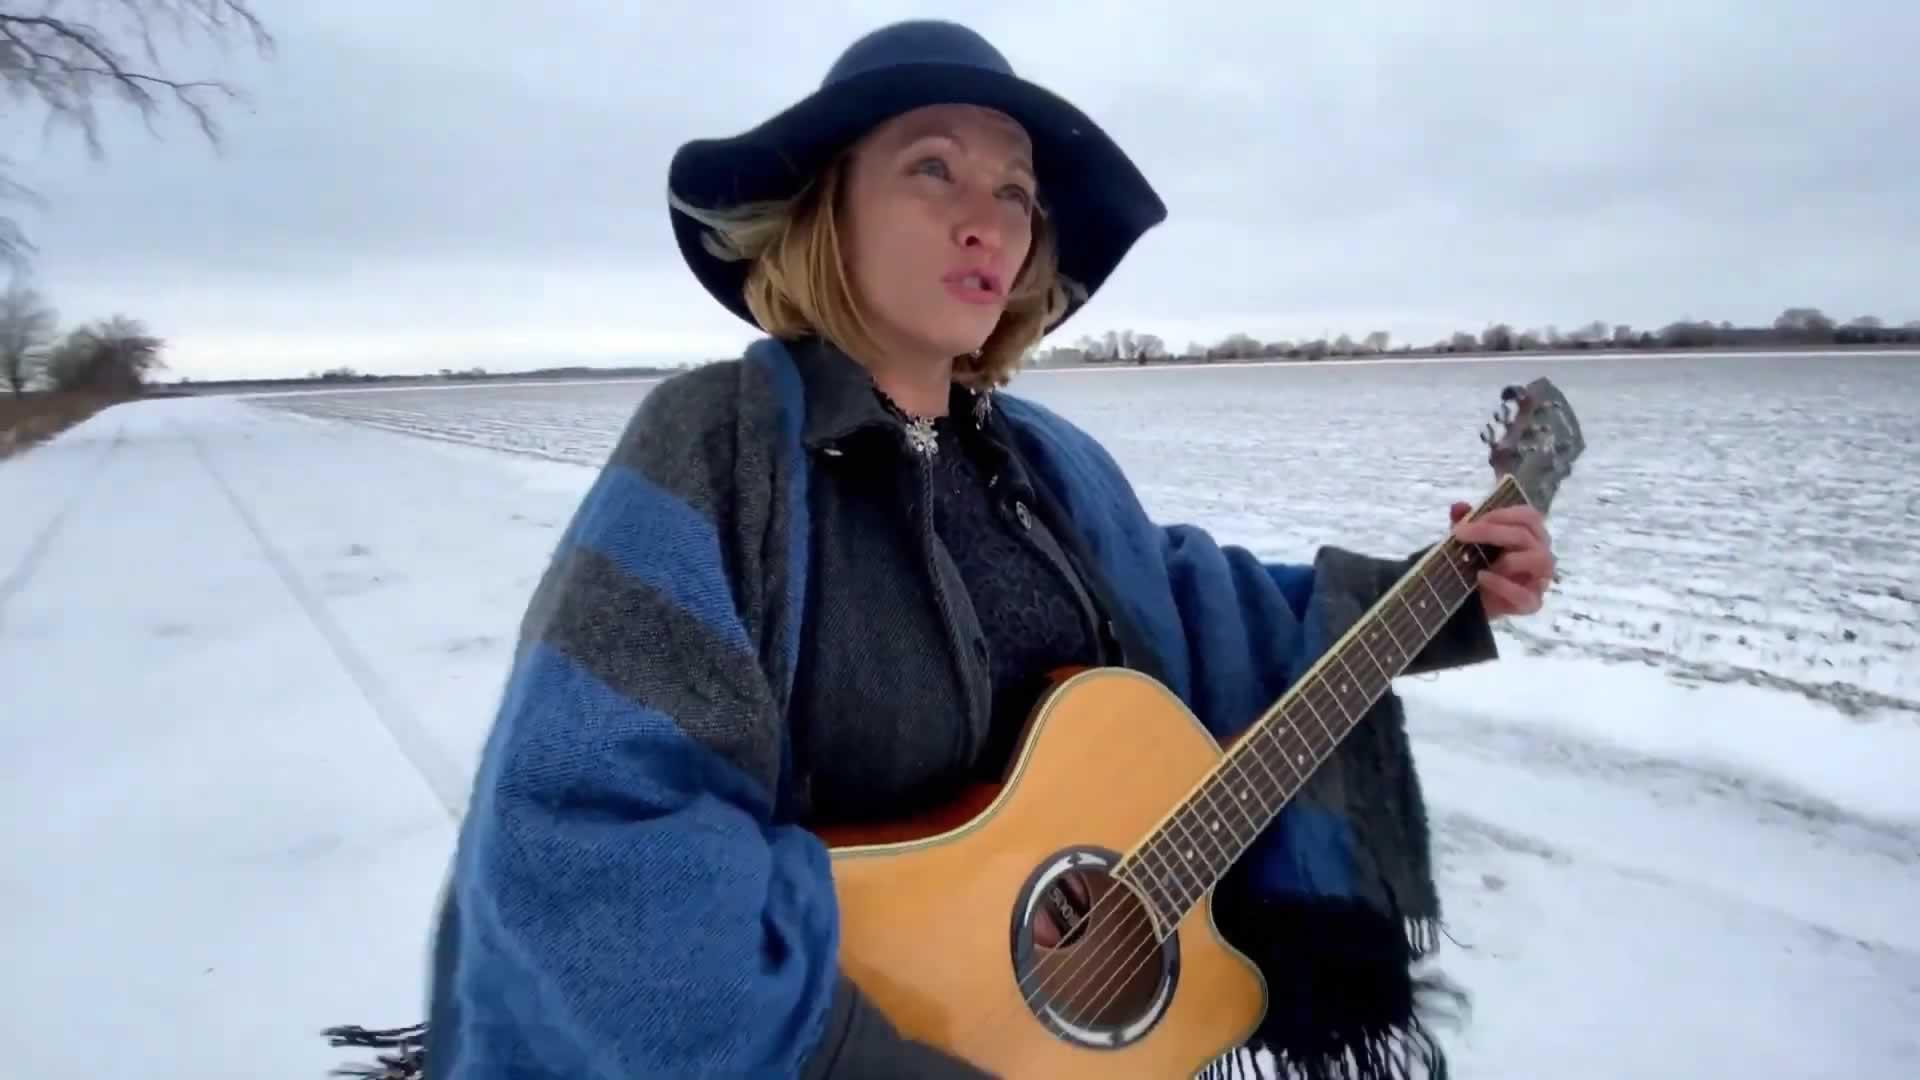 OPSEU/SEFPO Local 154 member Janice Hunter playing guitar and singing